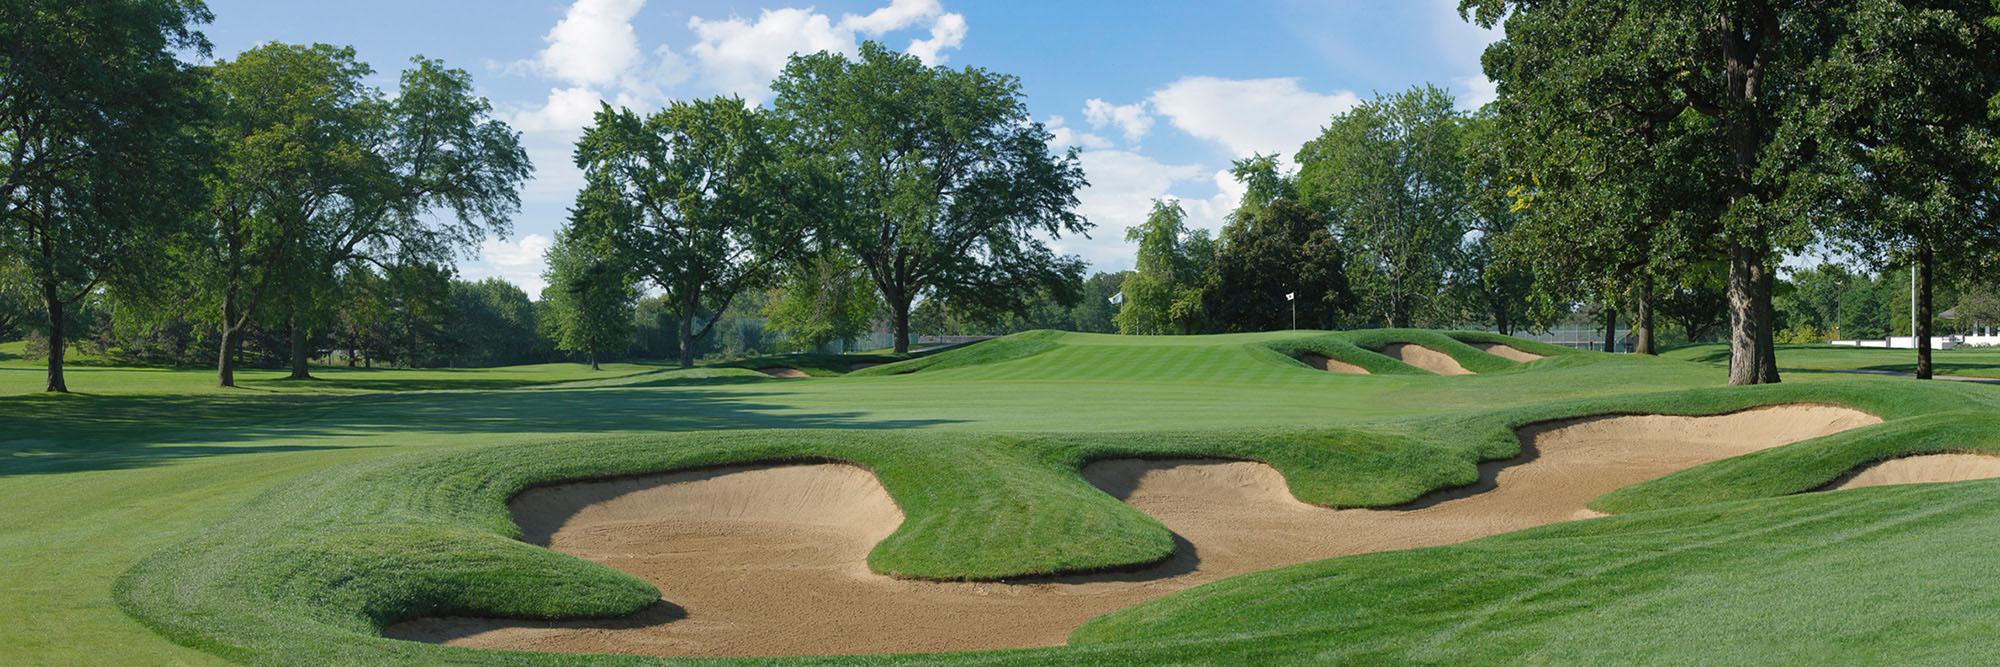 Golf Course Image - Cog Hill 4 No. 9